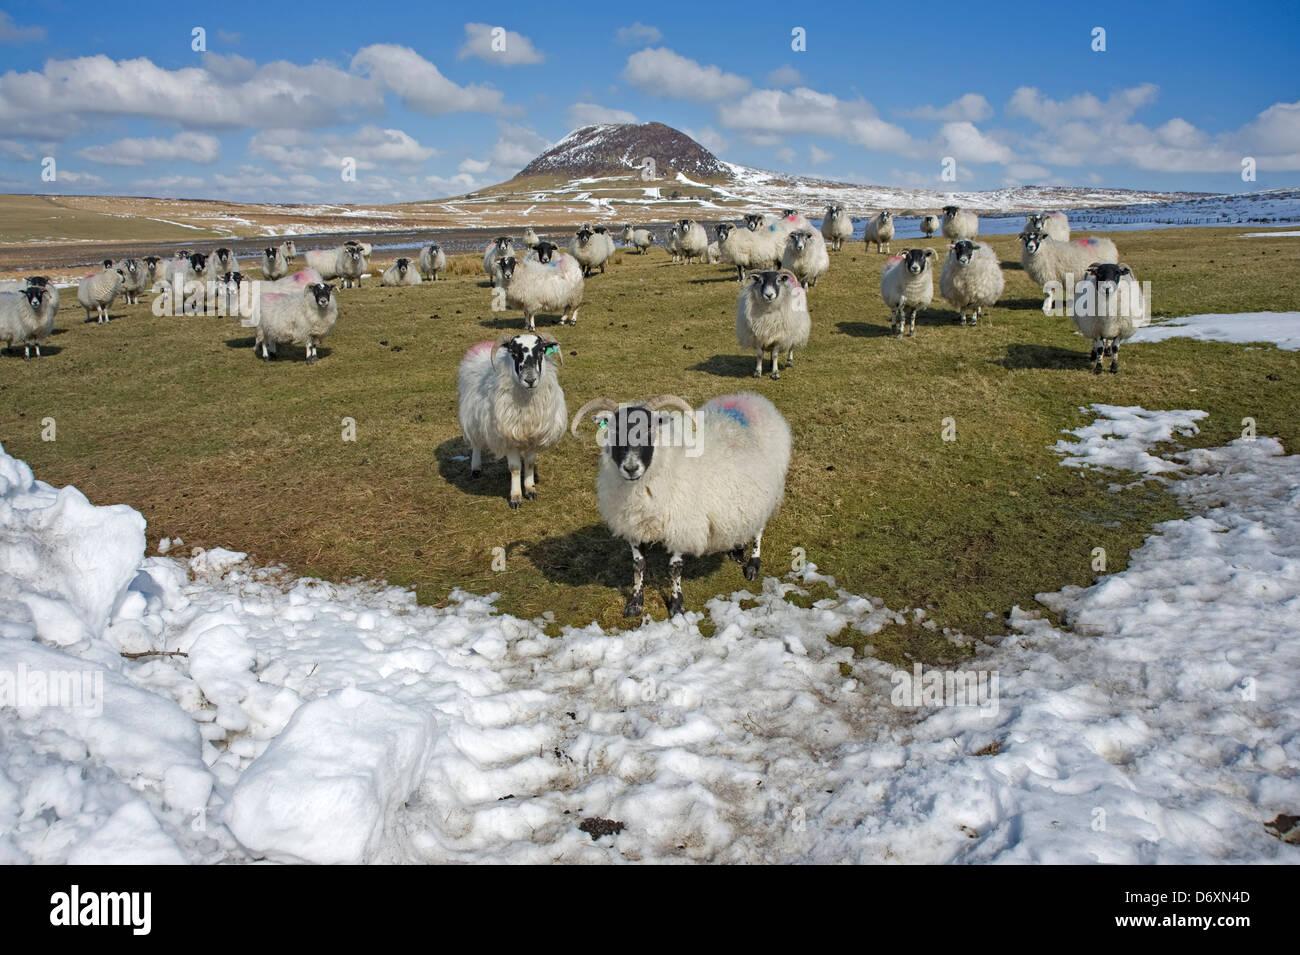 Sheep at Slemish, County Antrim, Northern Ireland. - Stock Image